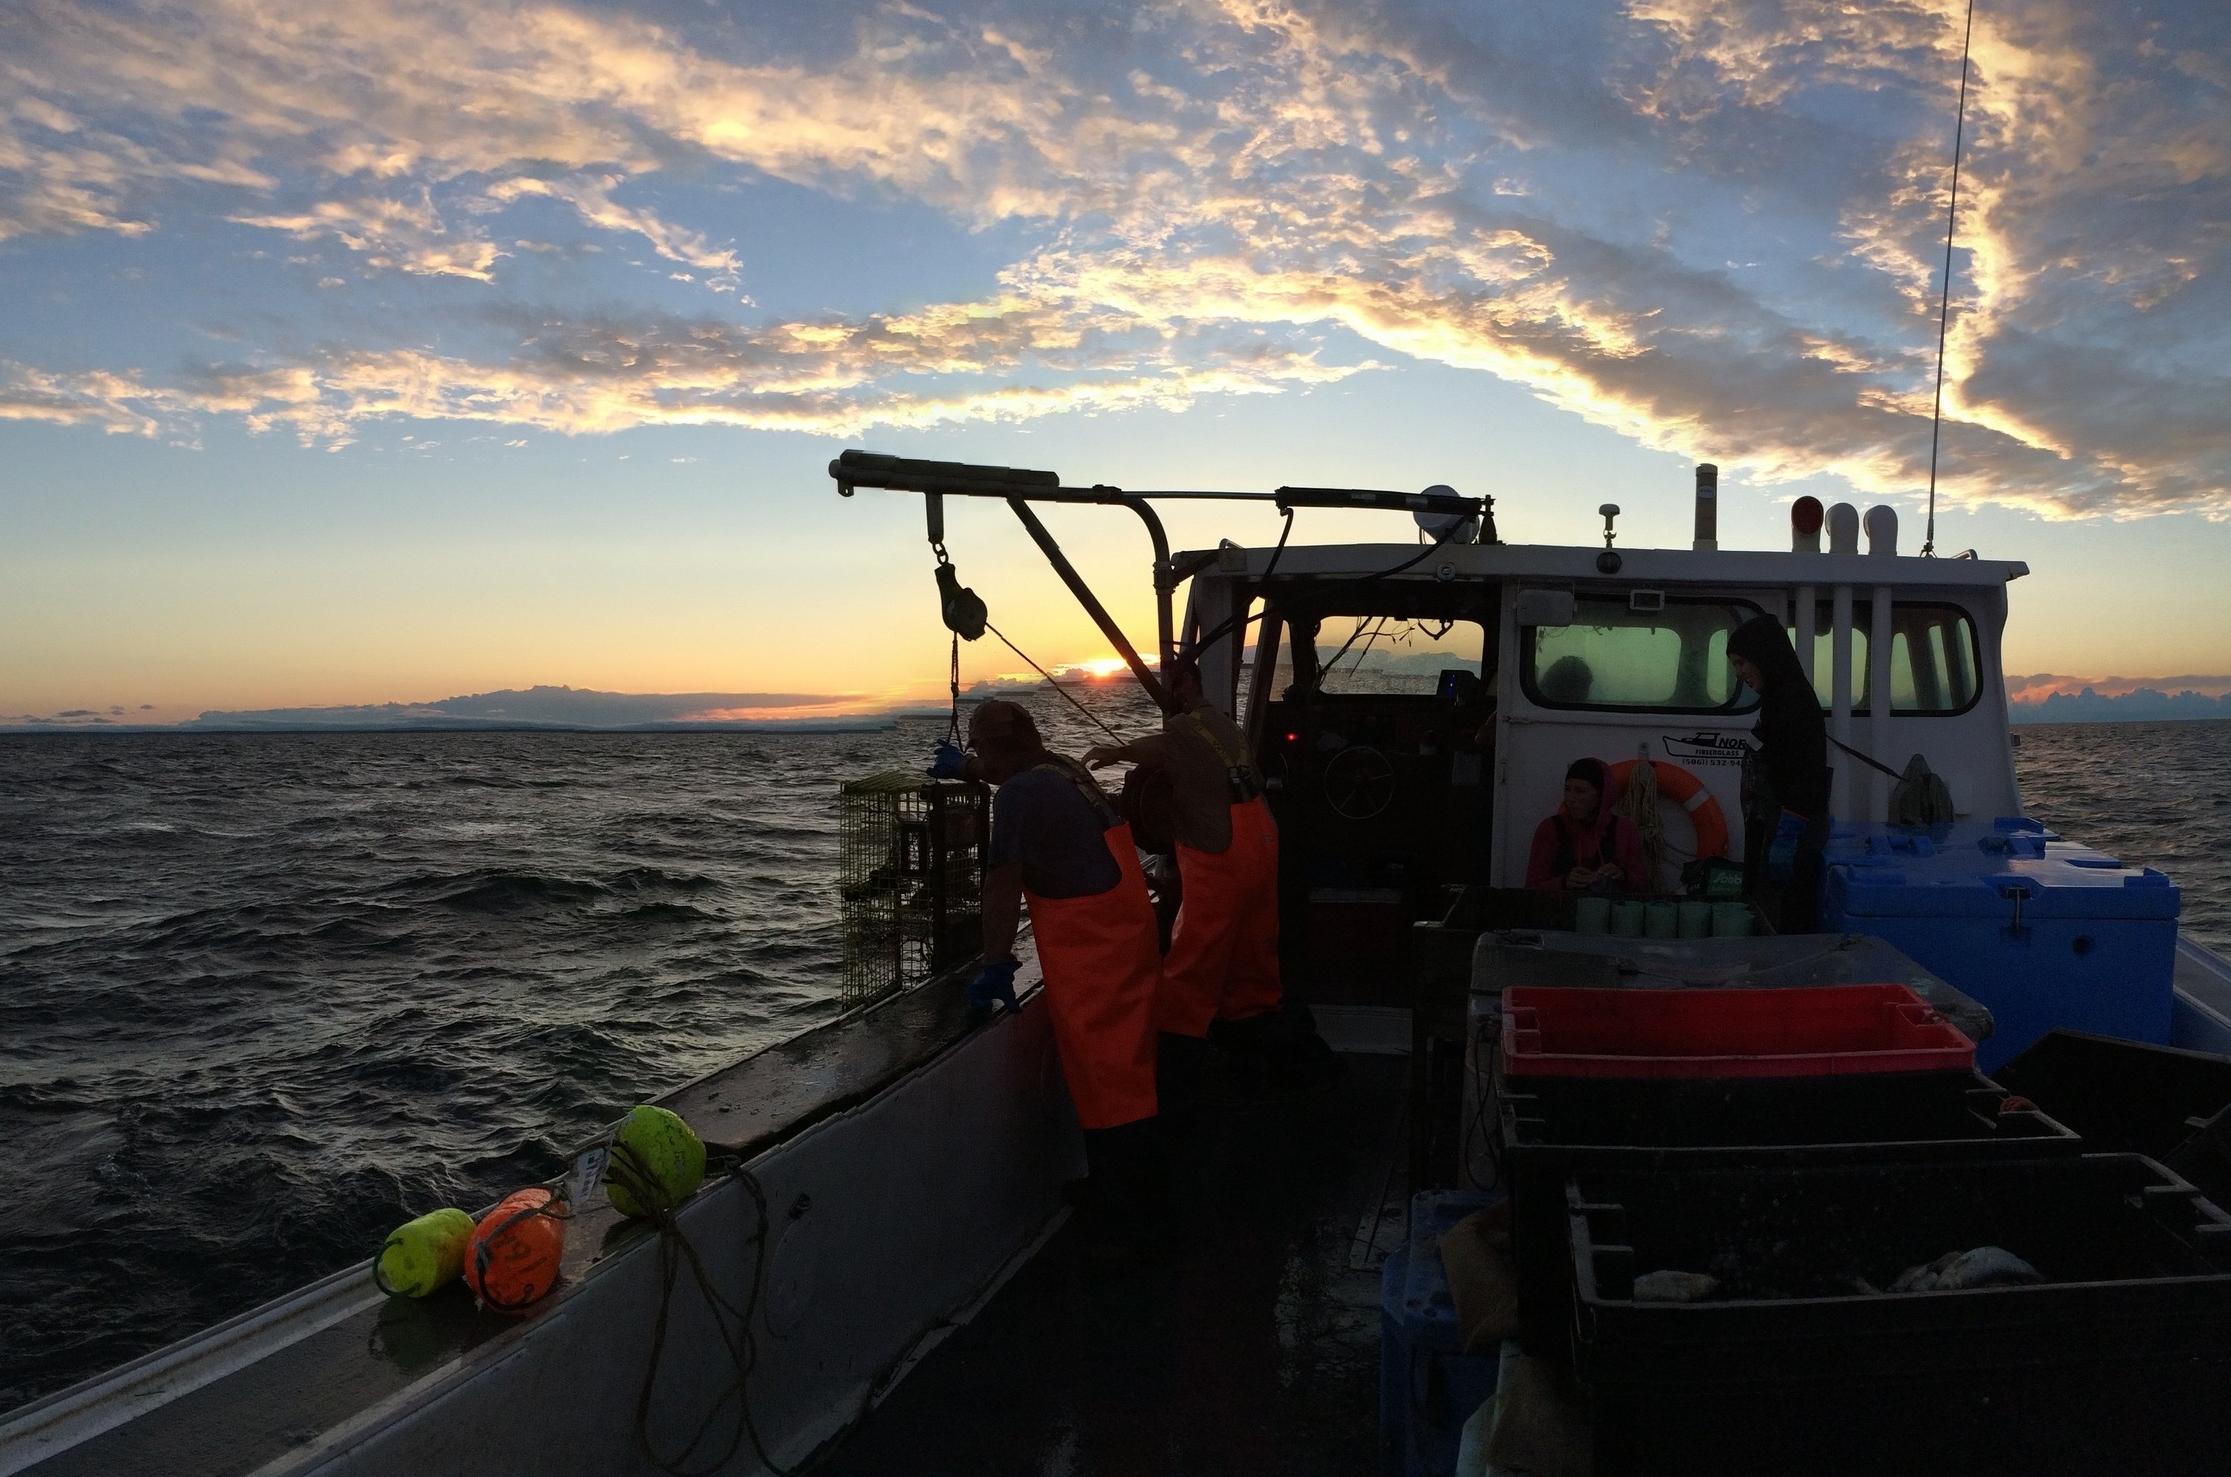 Fishermen economic viability improvement